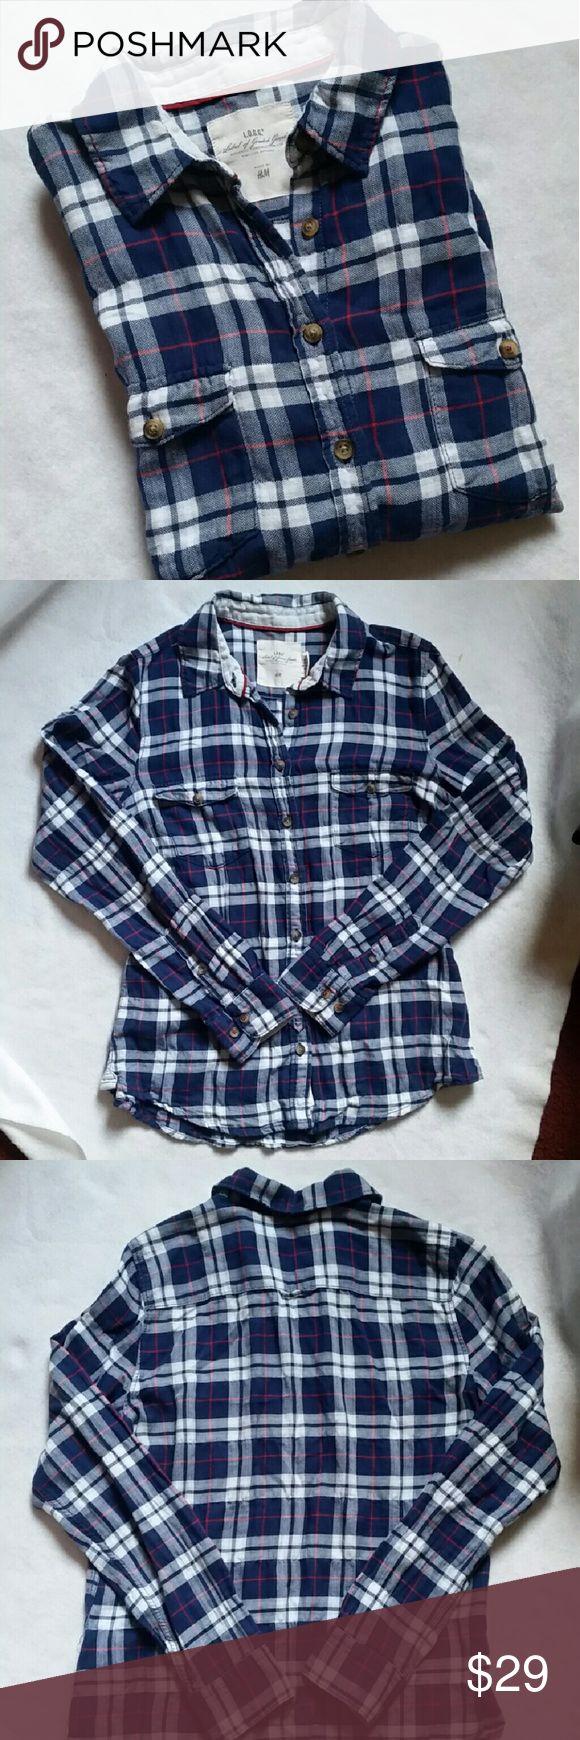 Plaid Button Down Plaid Button down shirt, flanel style by H&M. 99% cotton 1% elastane. H&M Tops Button Down Shirts